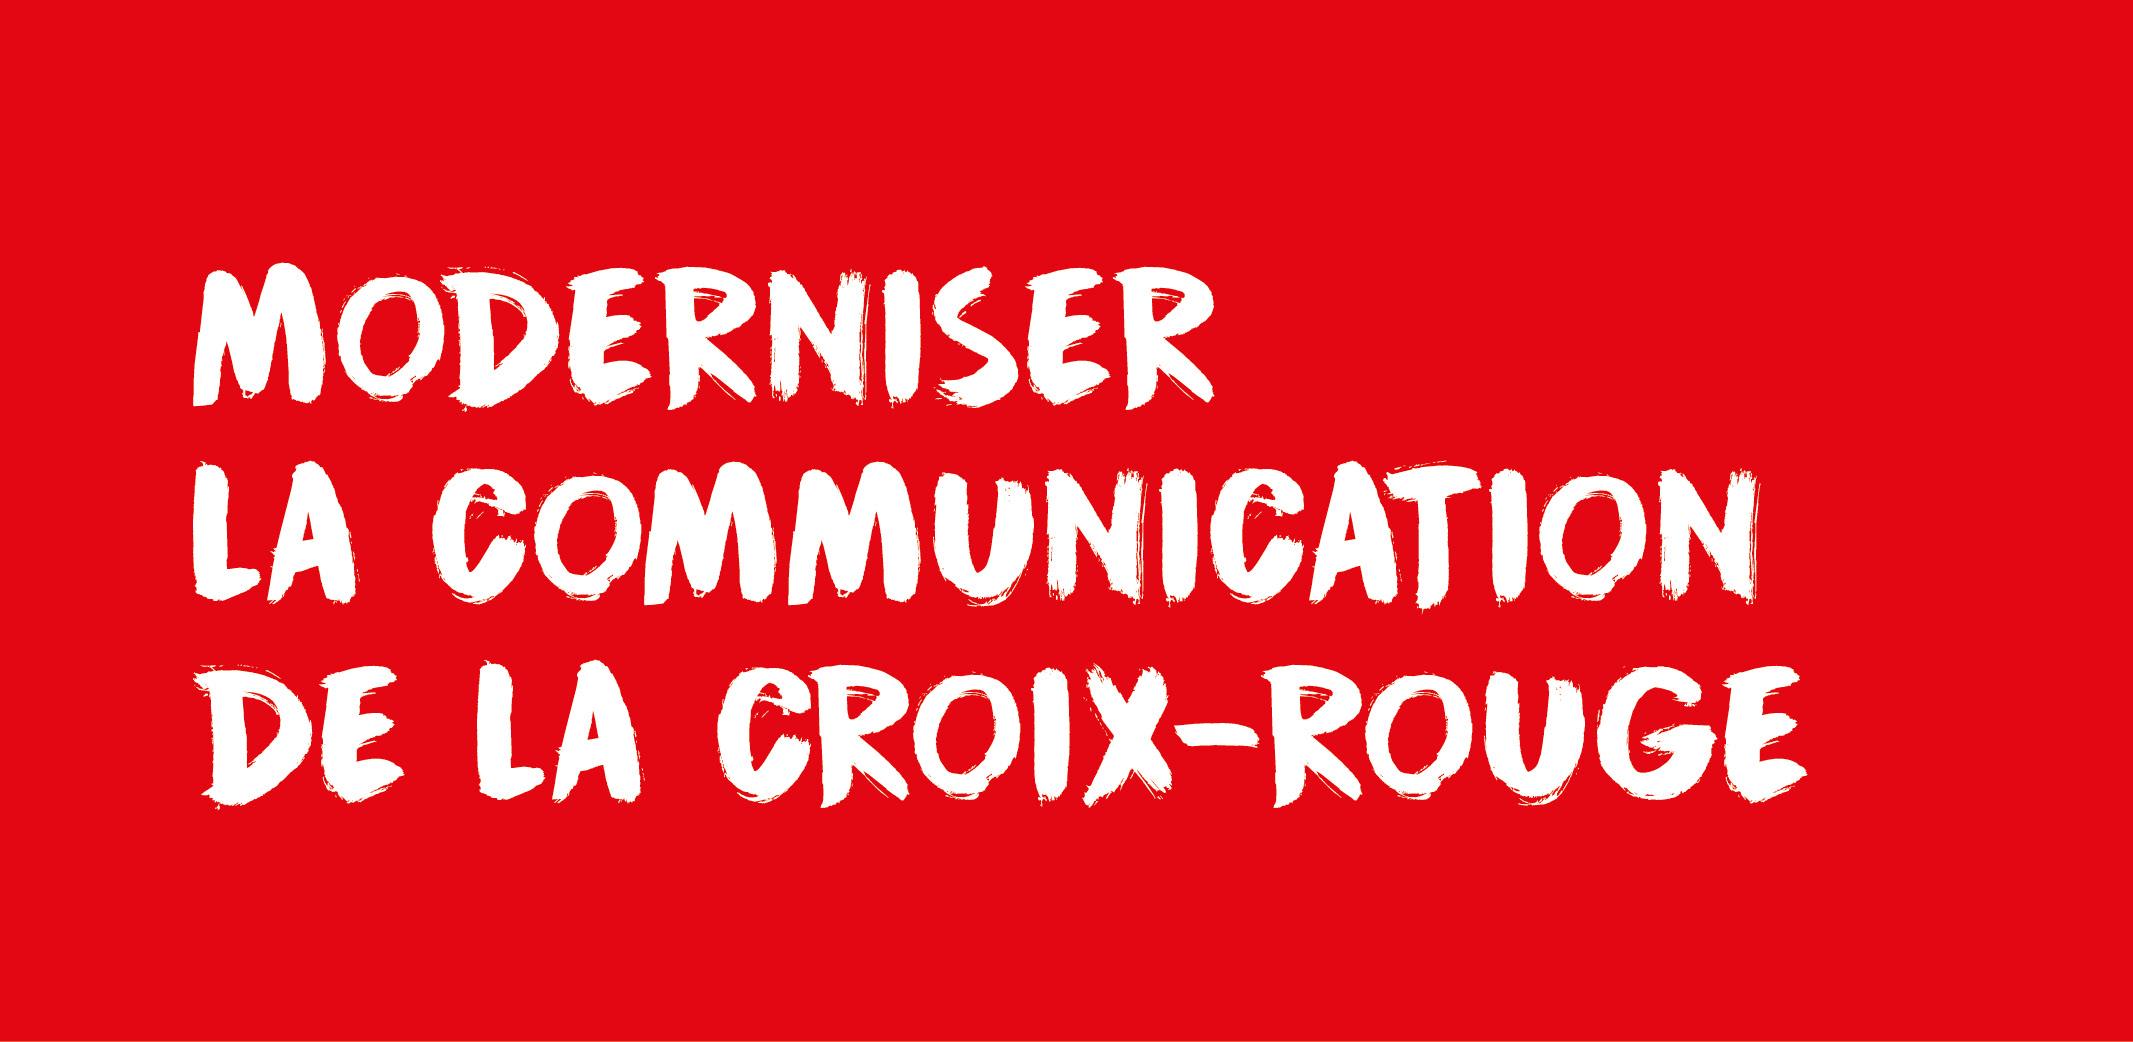 croix-rouge de belgique, studio fiftyfifty, fiftyfifty, graphisme, graphic design, agence de graphisme, agence de communication, agence de graphisme bruxelles, graphic design agency brussels